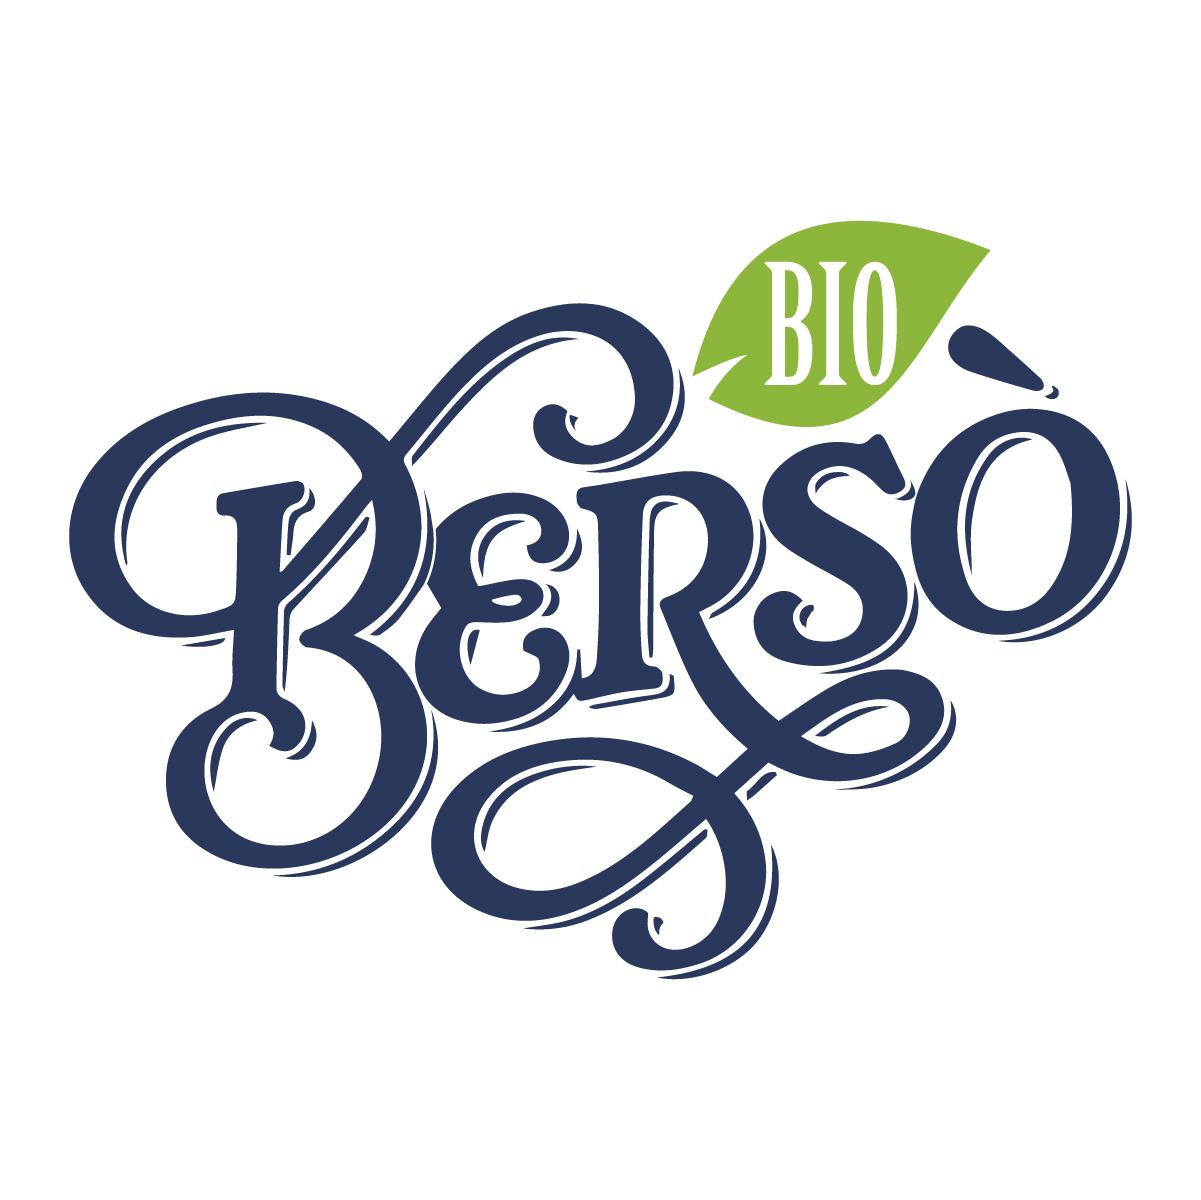 Logo e naming Biobersò